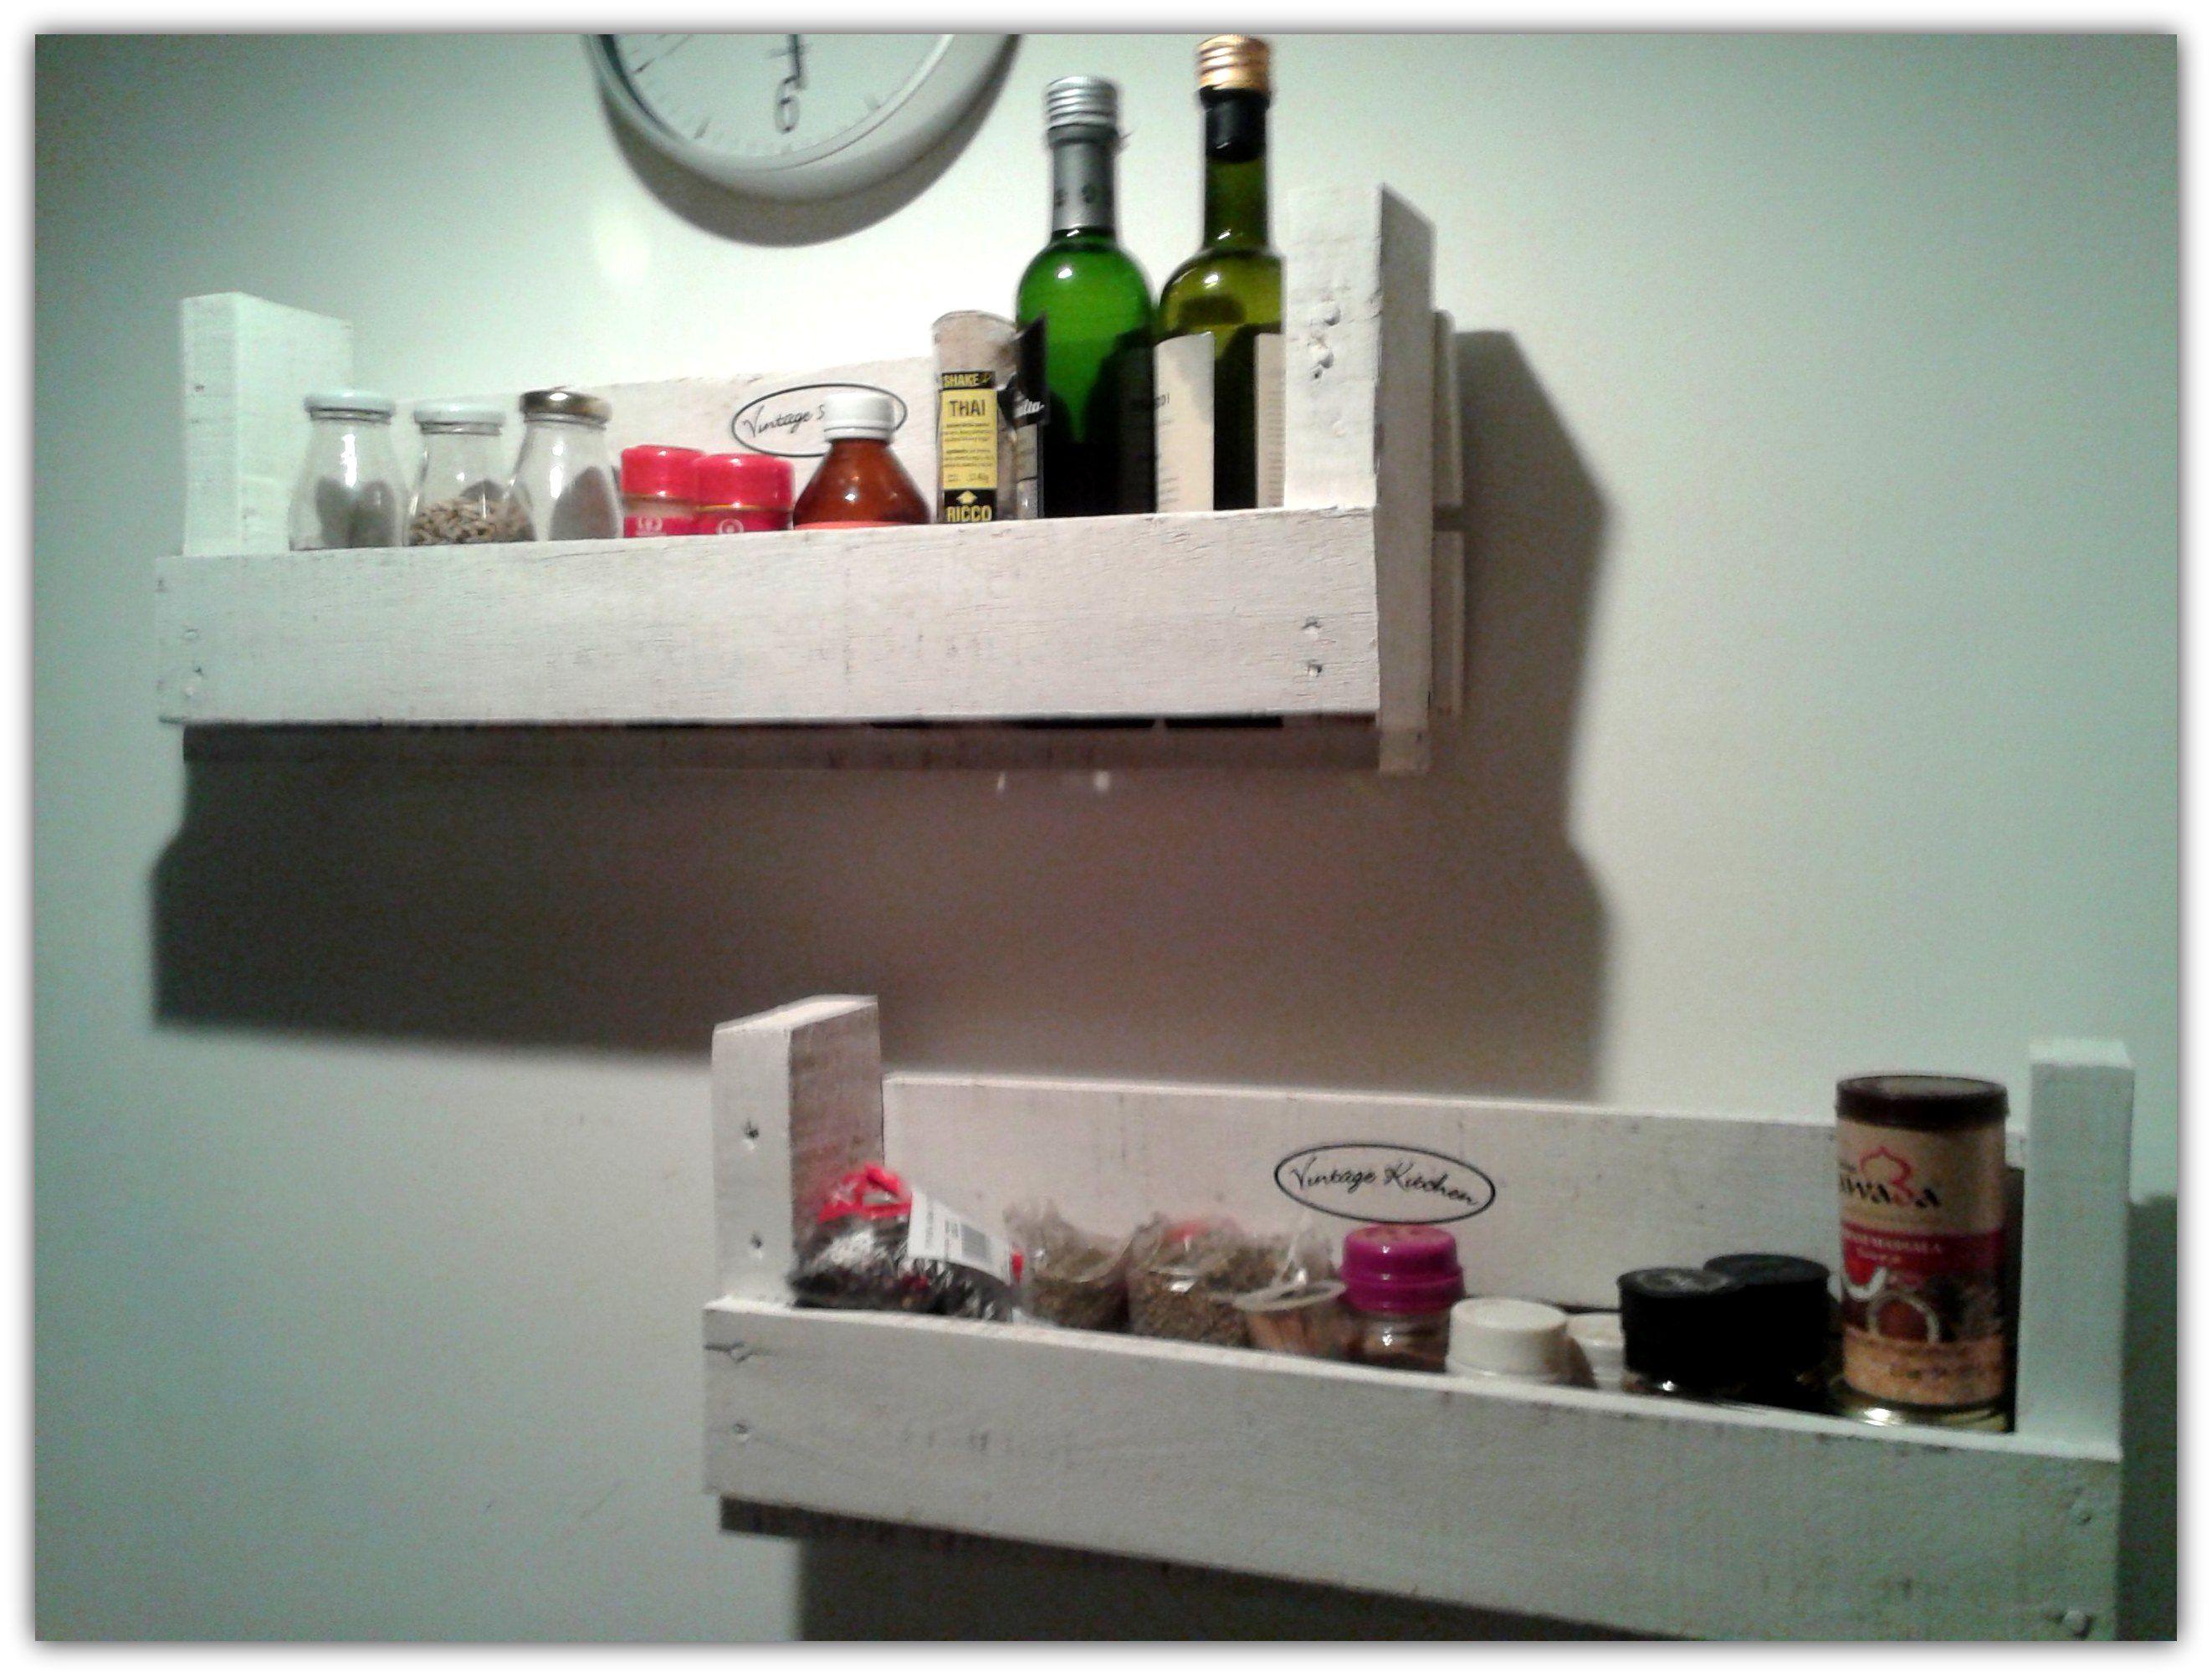 Estanterias para cocina estantes de pared atractivo para - Ideas para estanterias ...